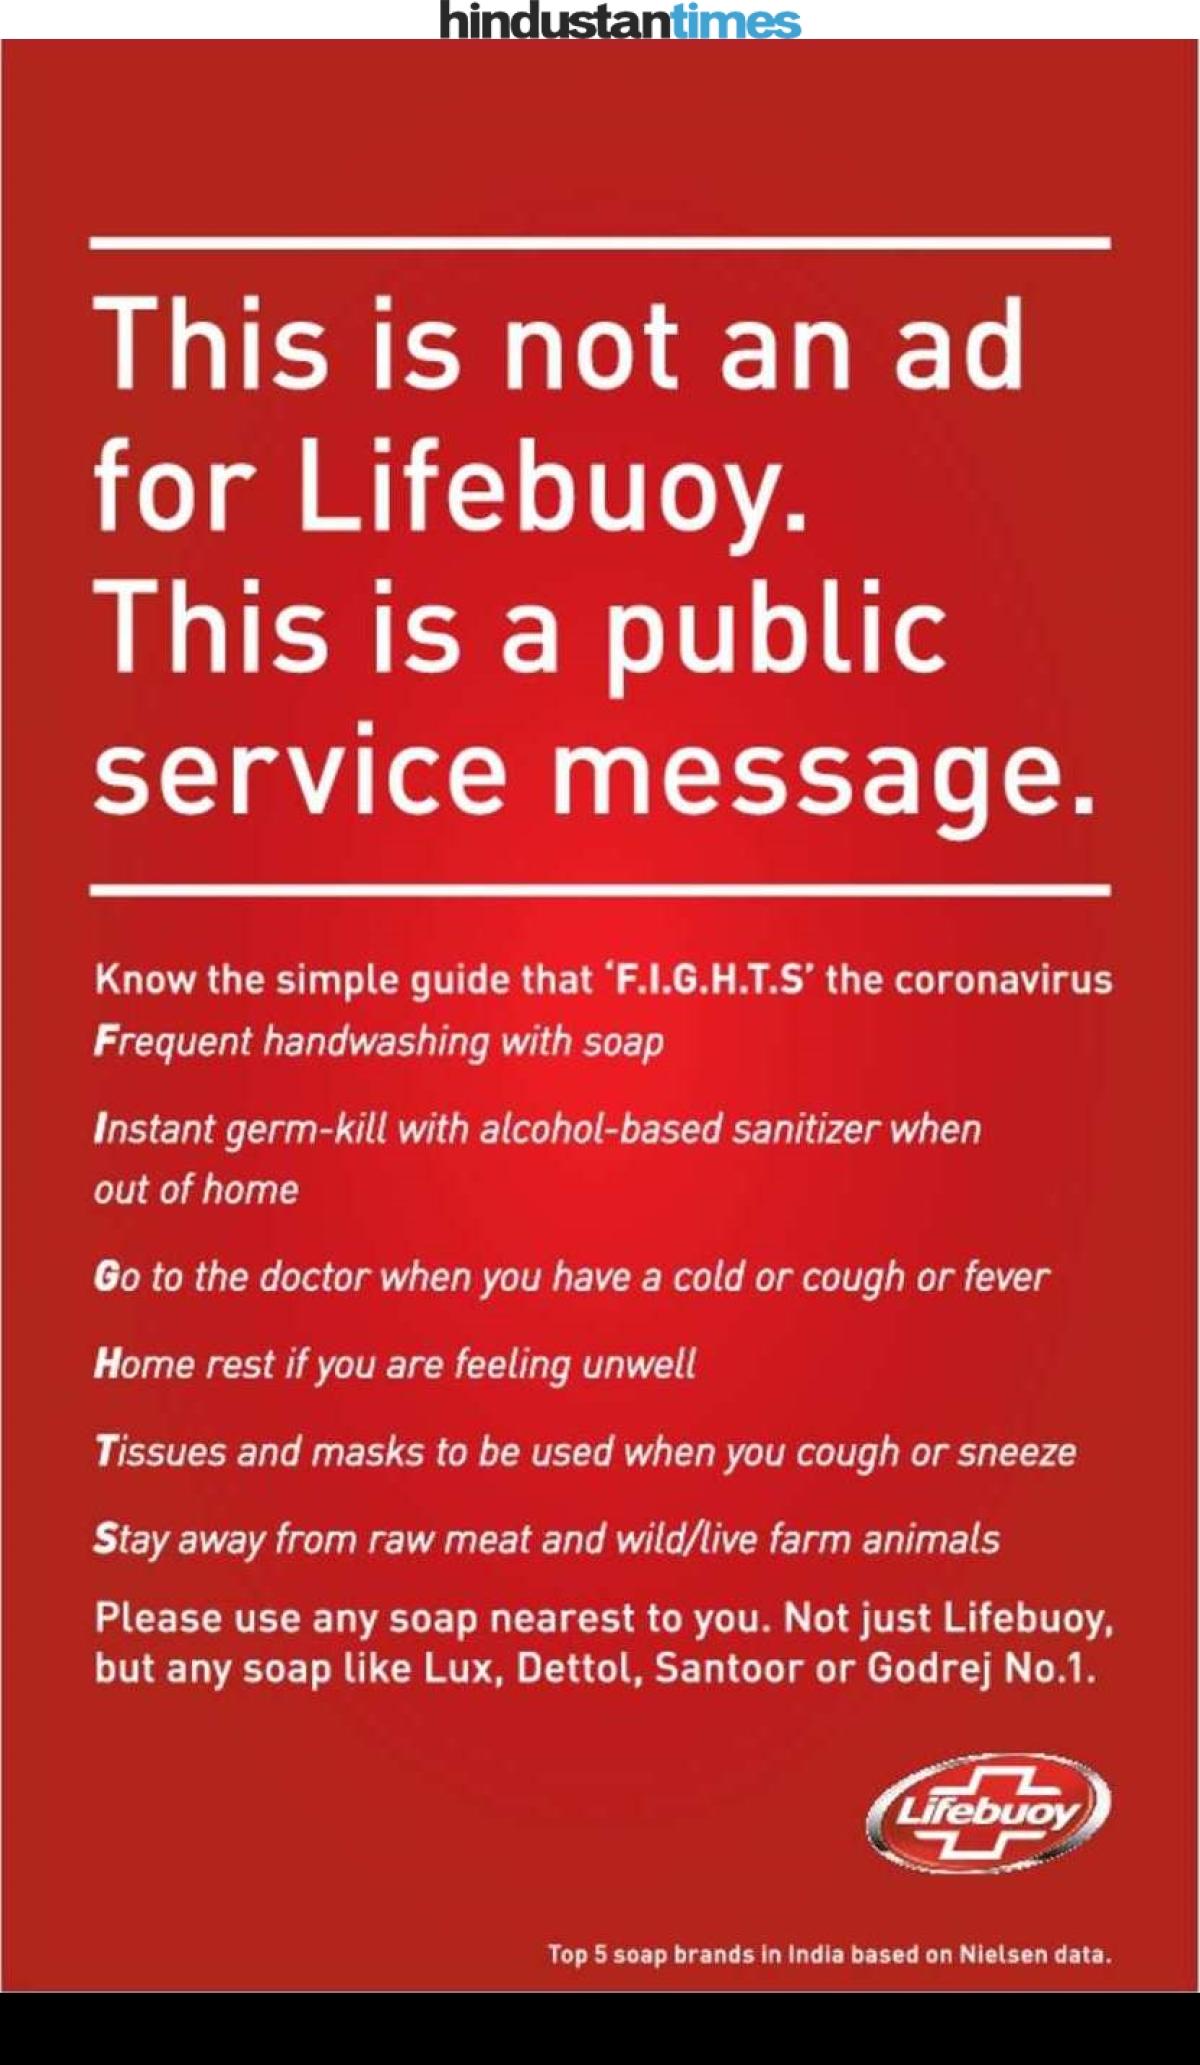 Lifebuoy's print ad in Hindustan Times